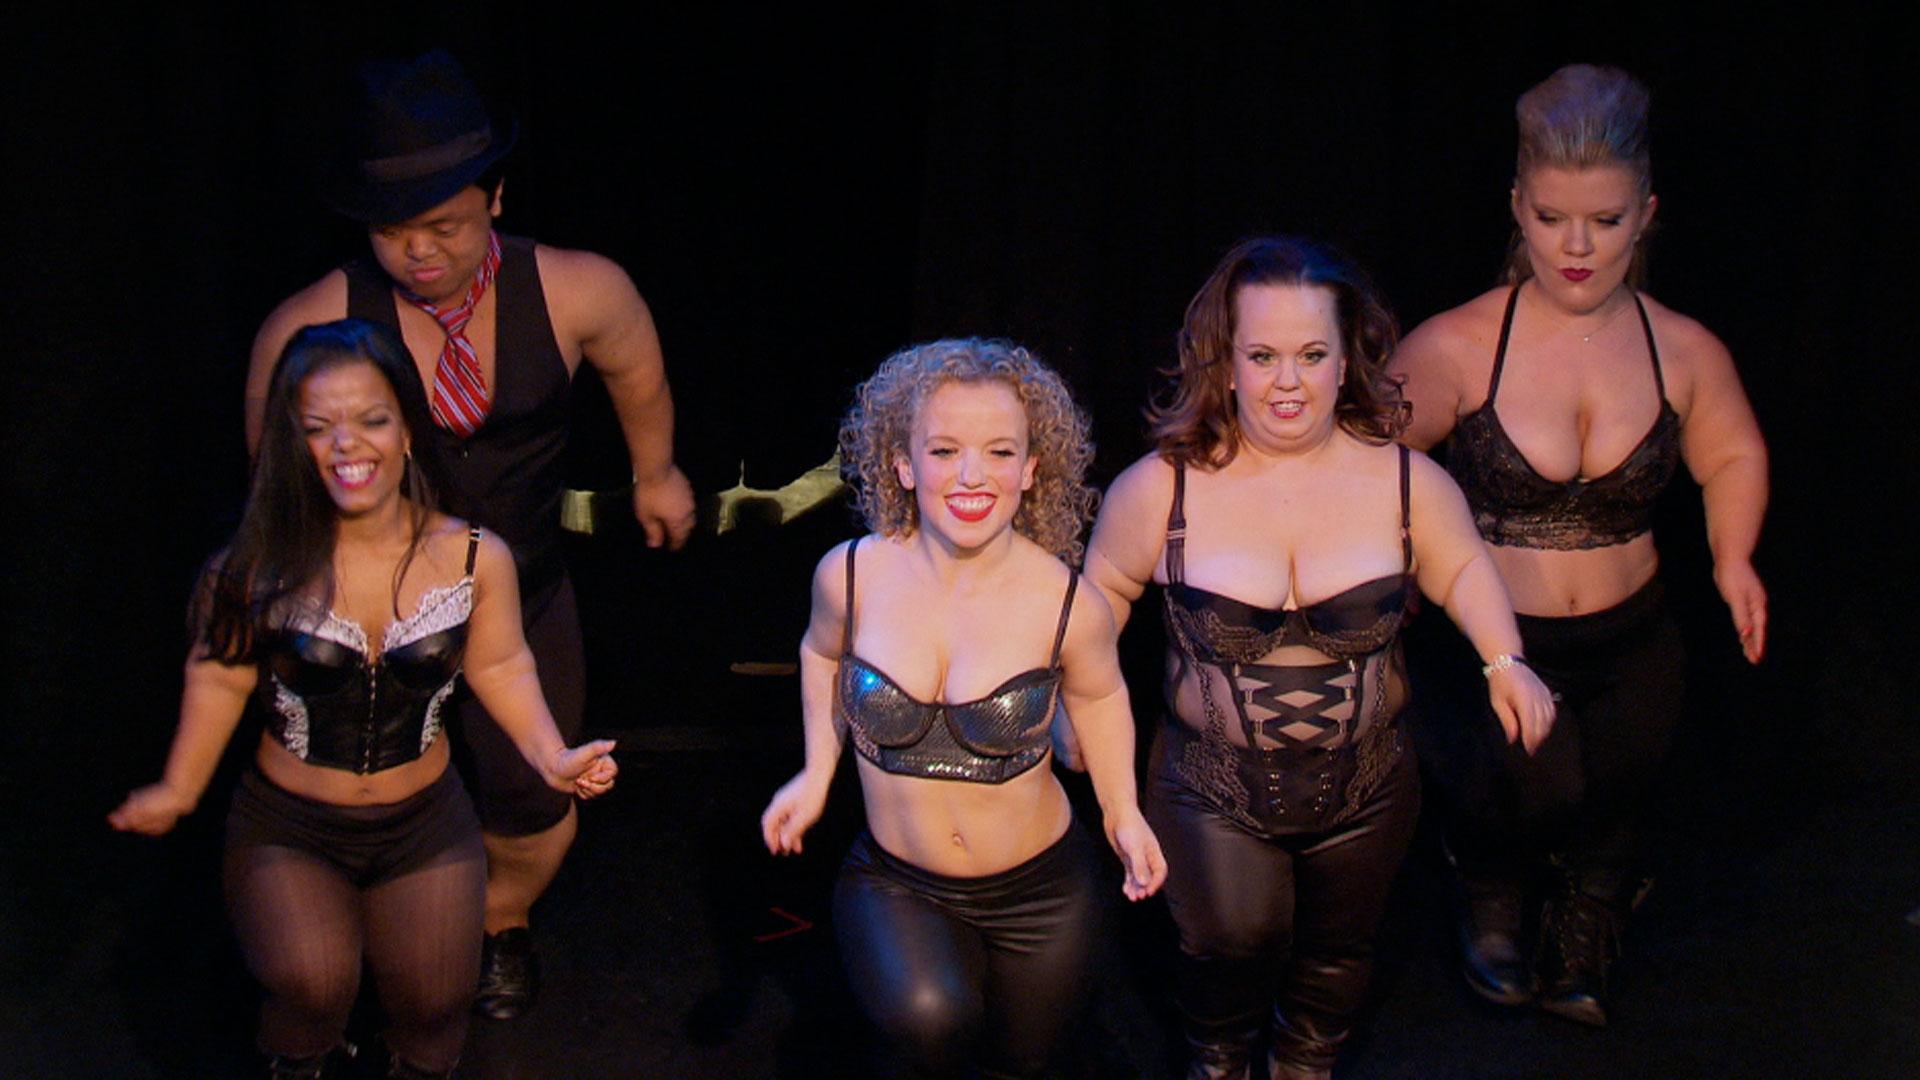 Little Women: NY : Burlesque Brawl